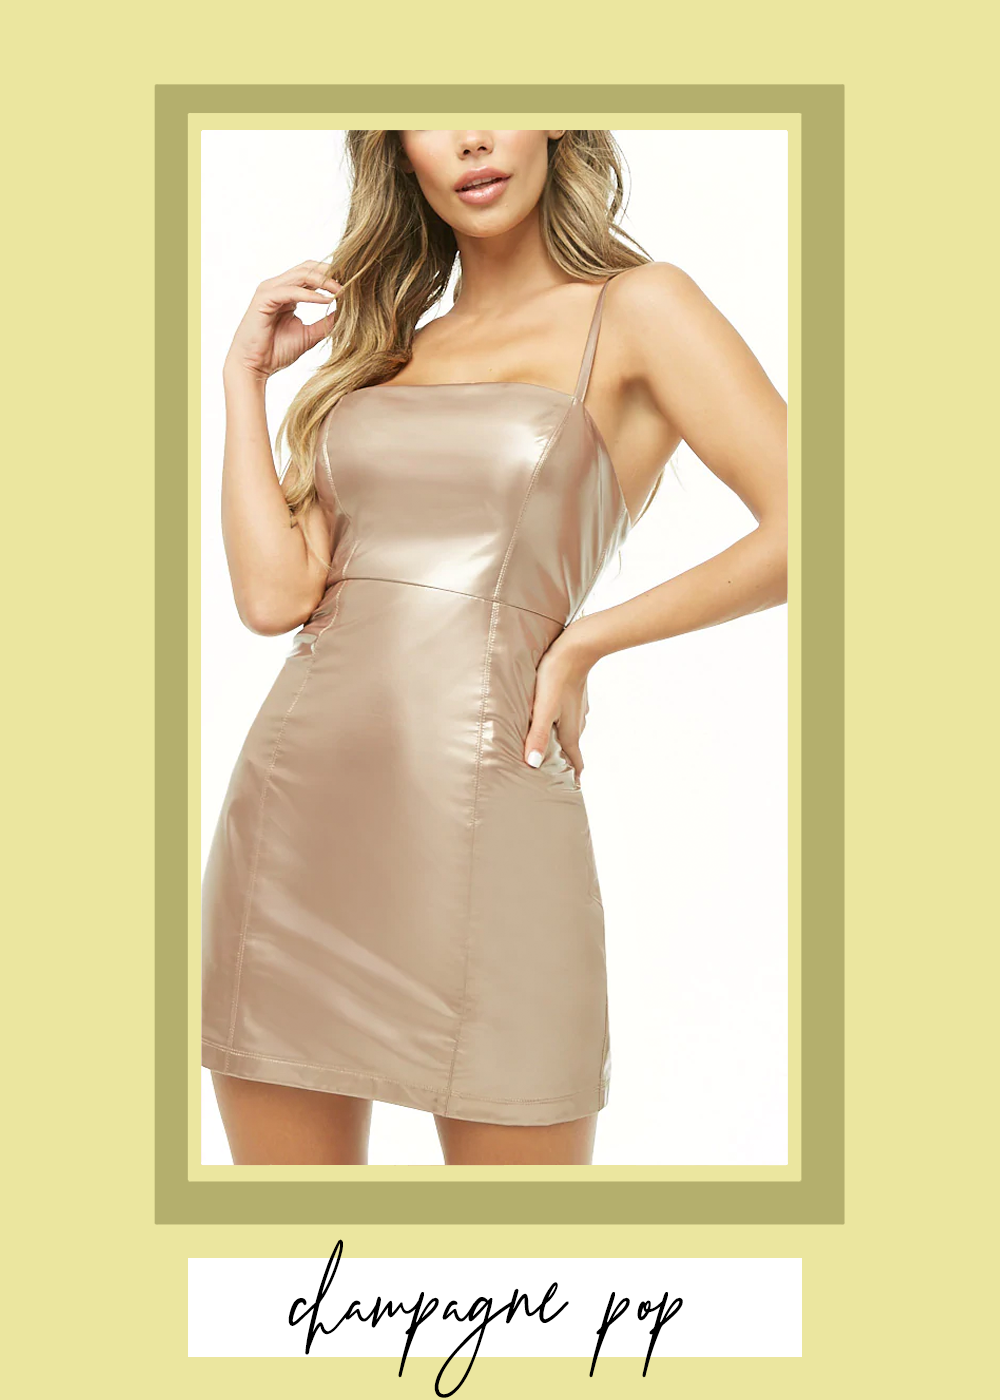 006. - Metallic Faux Patent Leather Mini DressForever 21 // $25